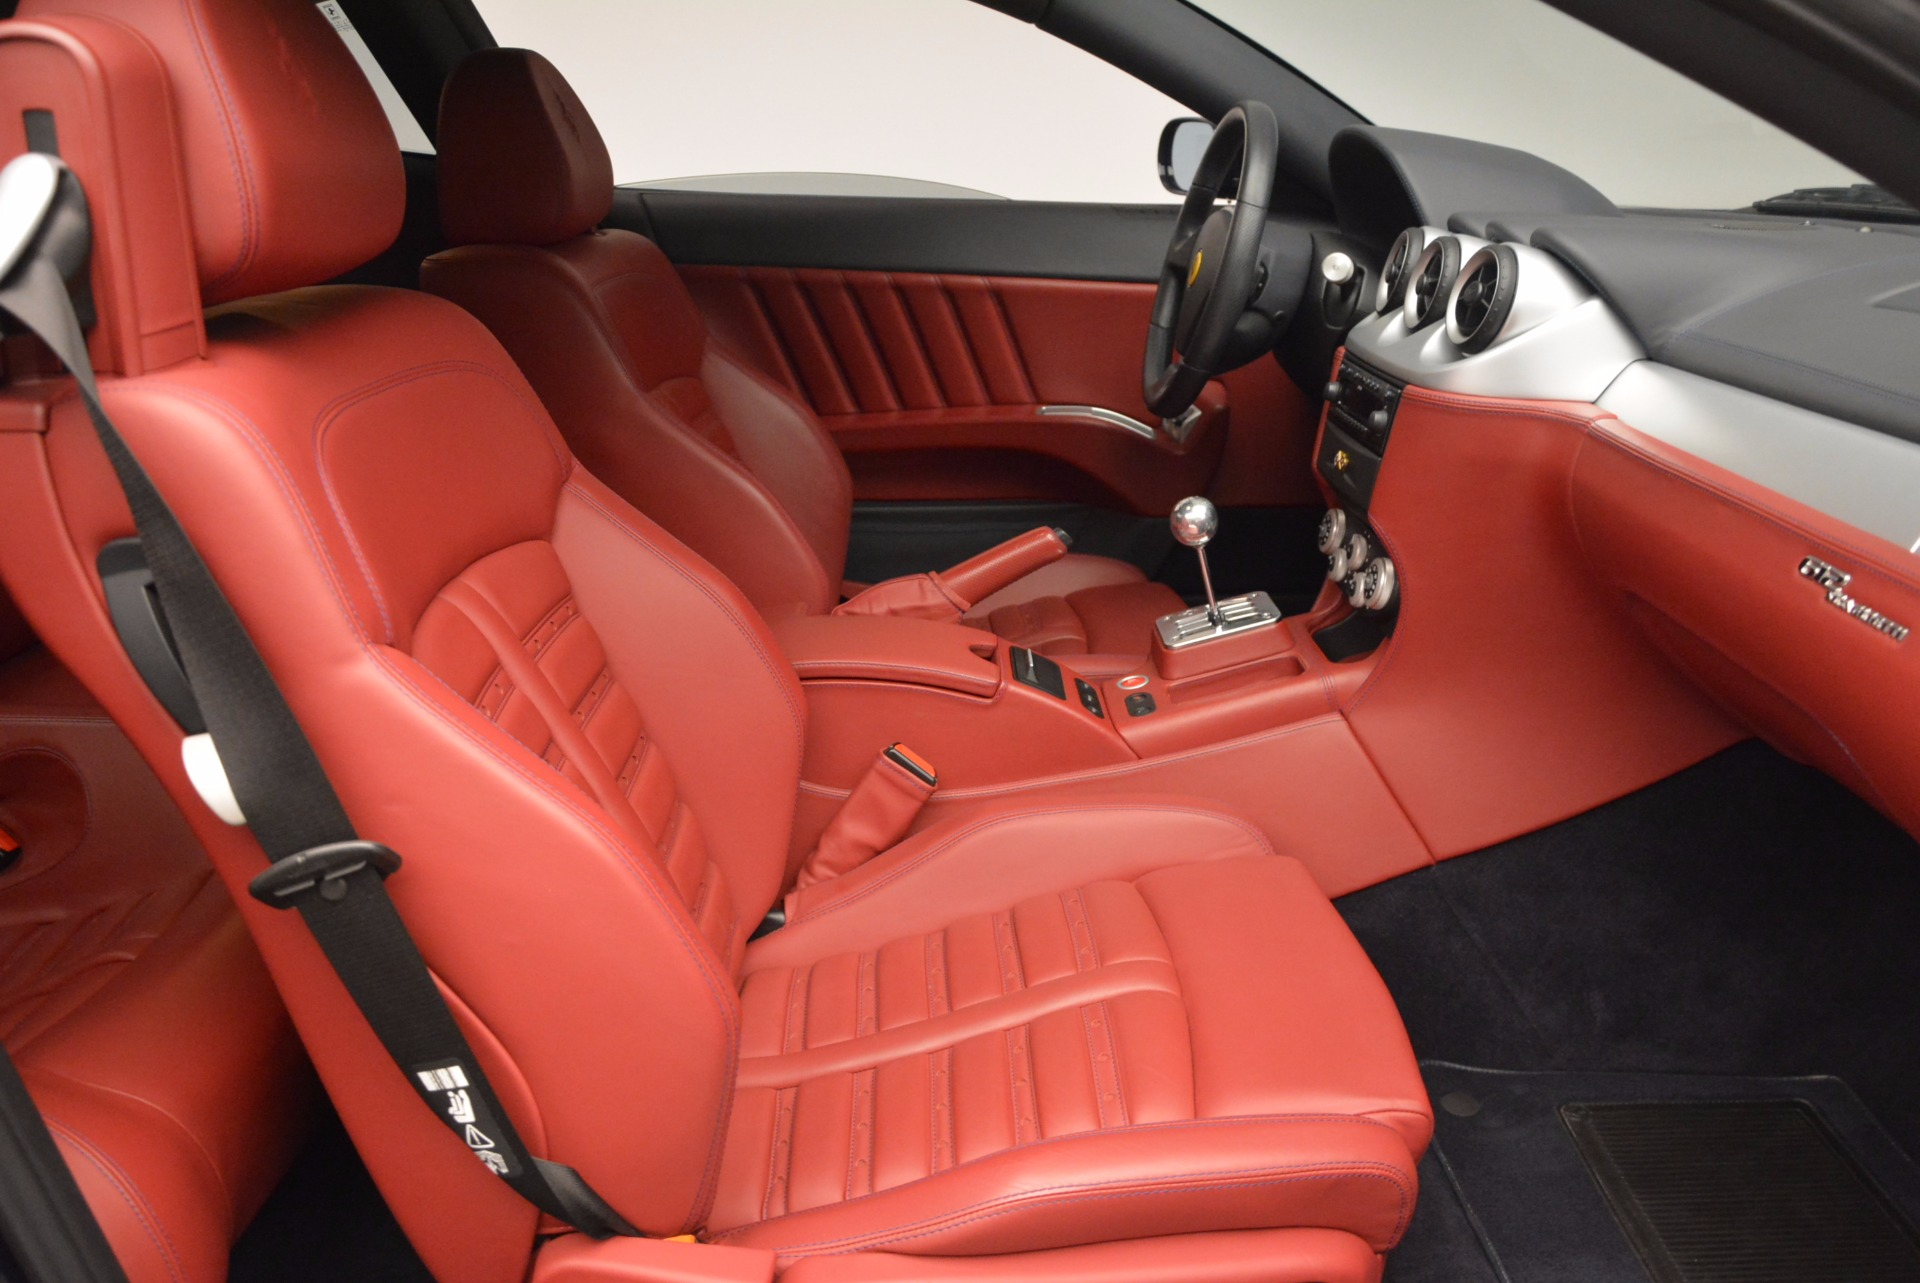 Used 2005 Ferrari 612 Scaglietti 6-Speed Manual For Sale In Westport, CT 854_p19